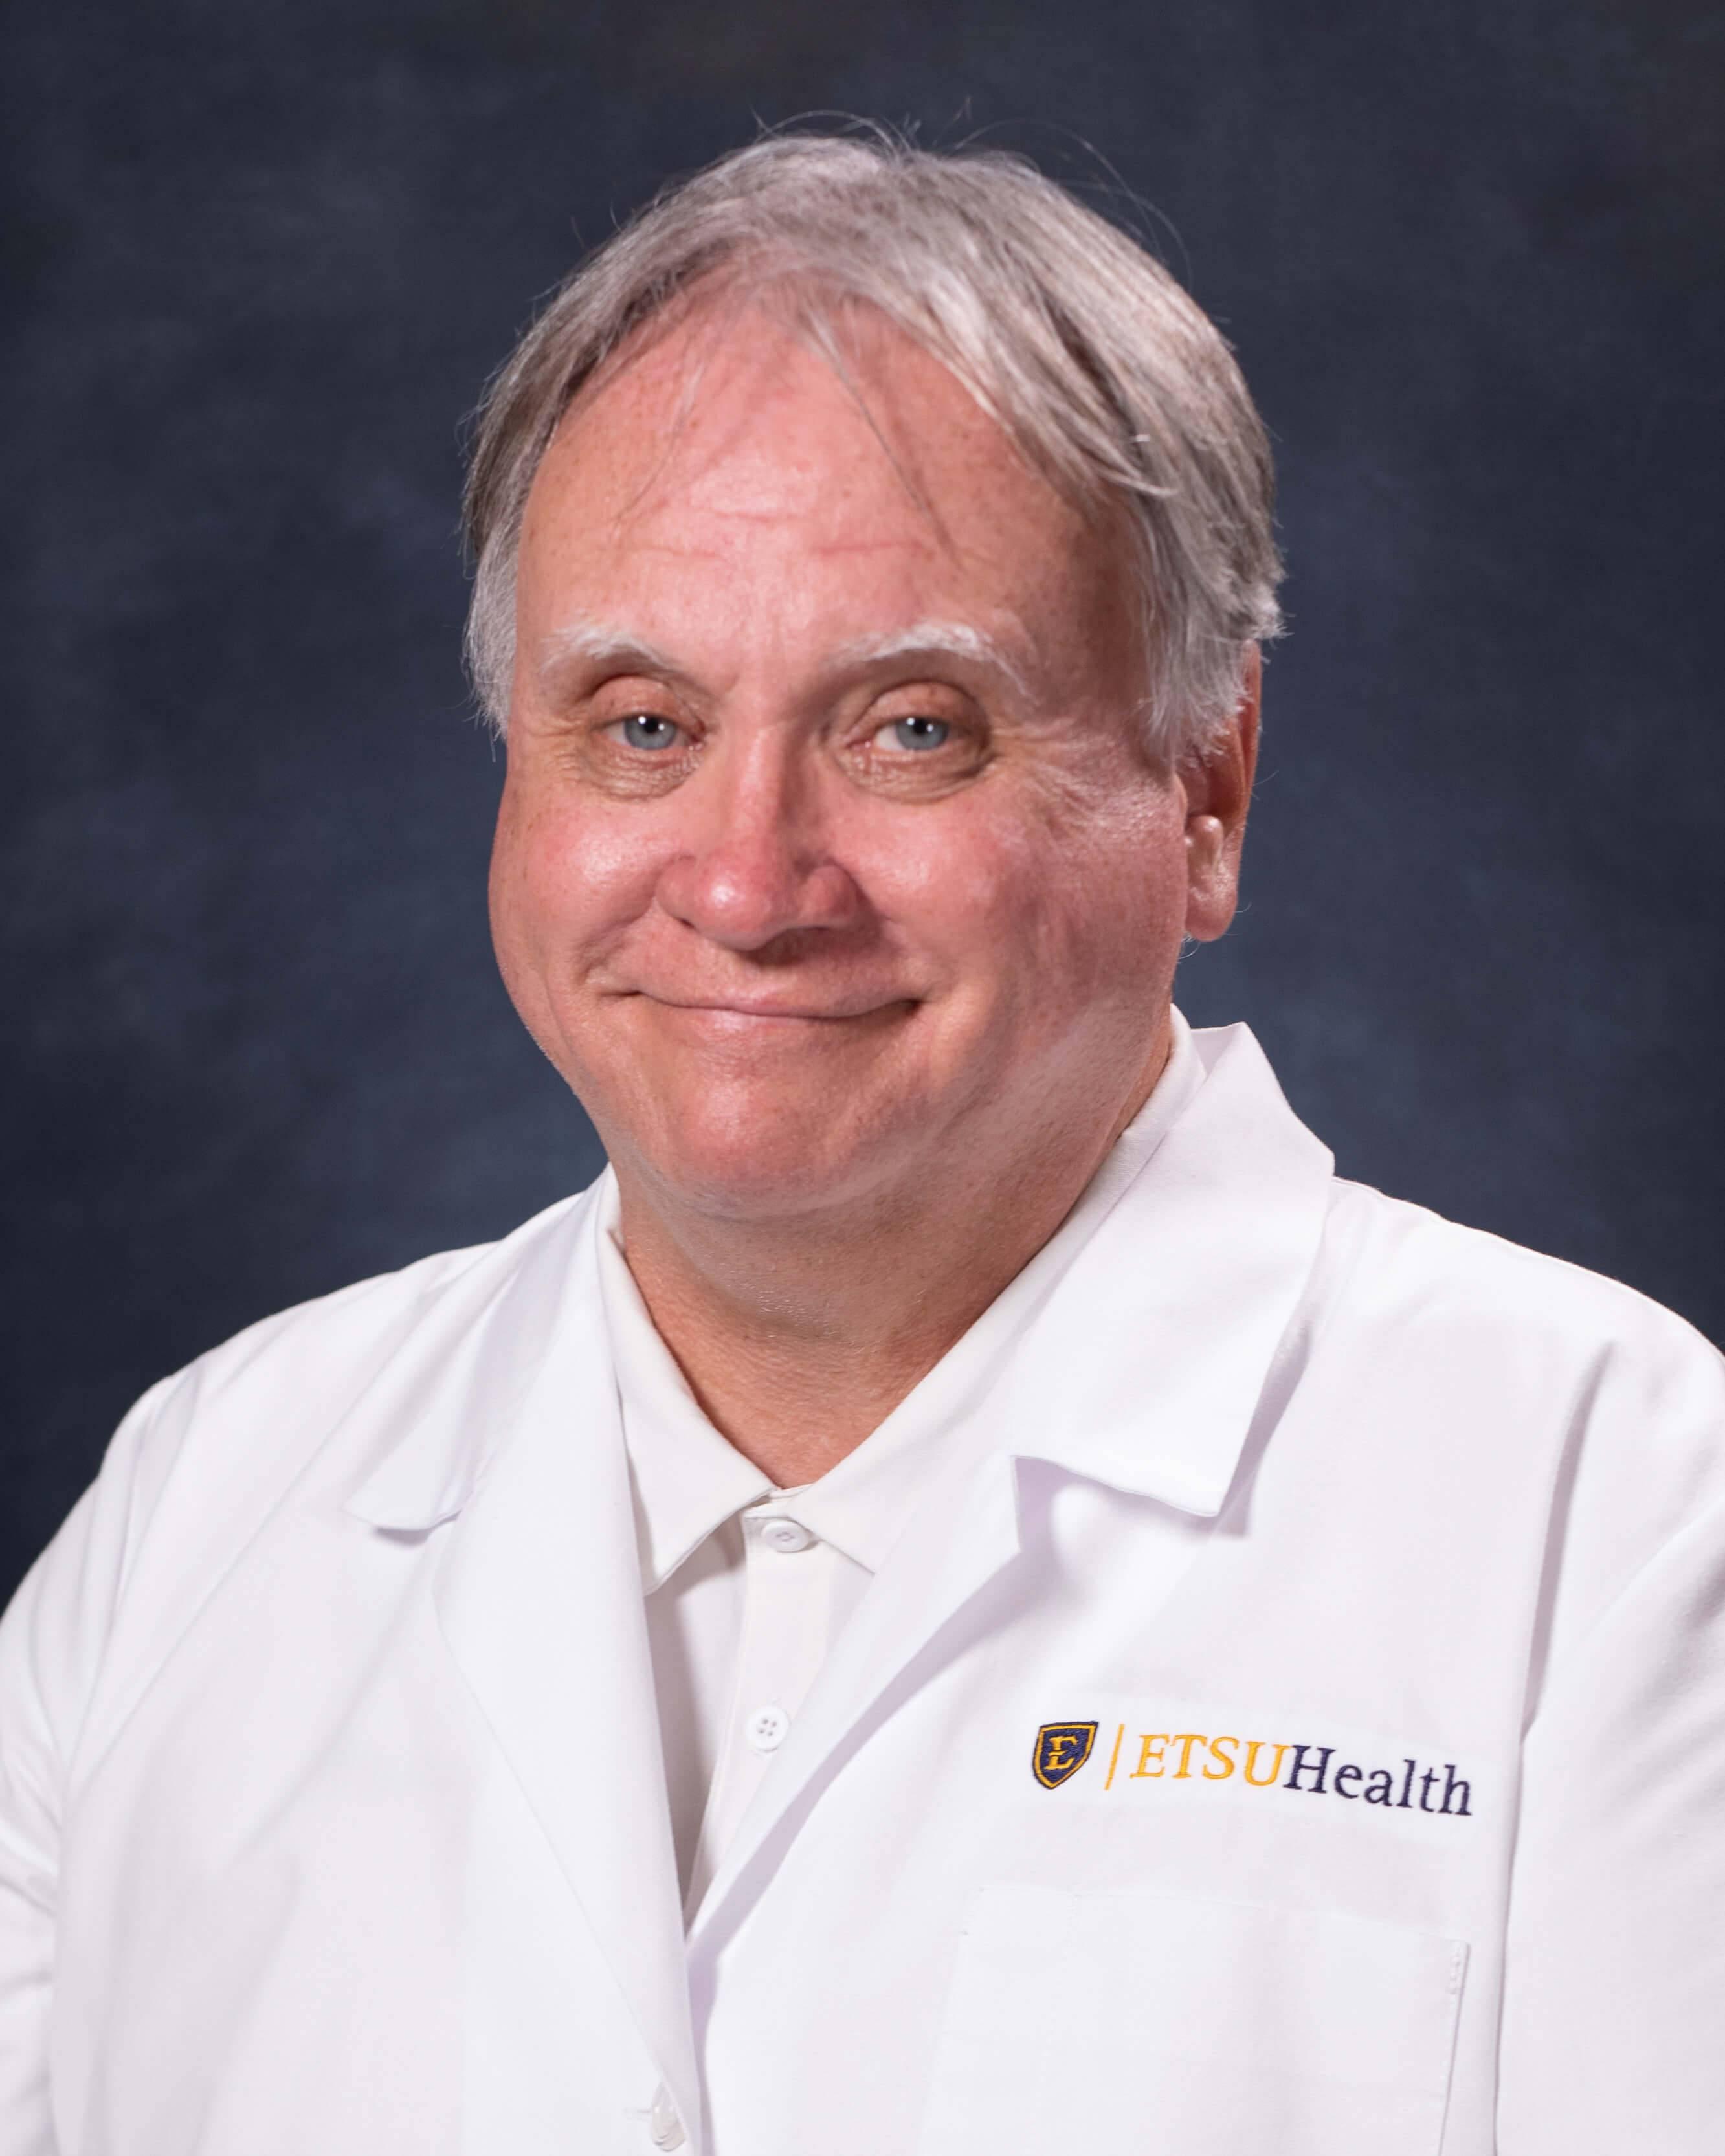 Photo of Ralph Mills, M.D.